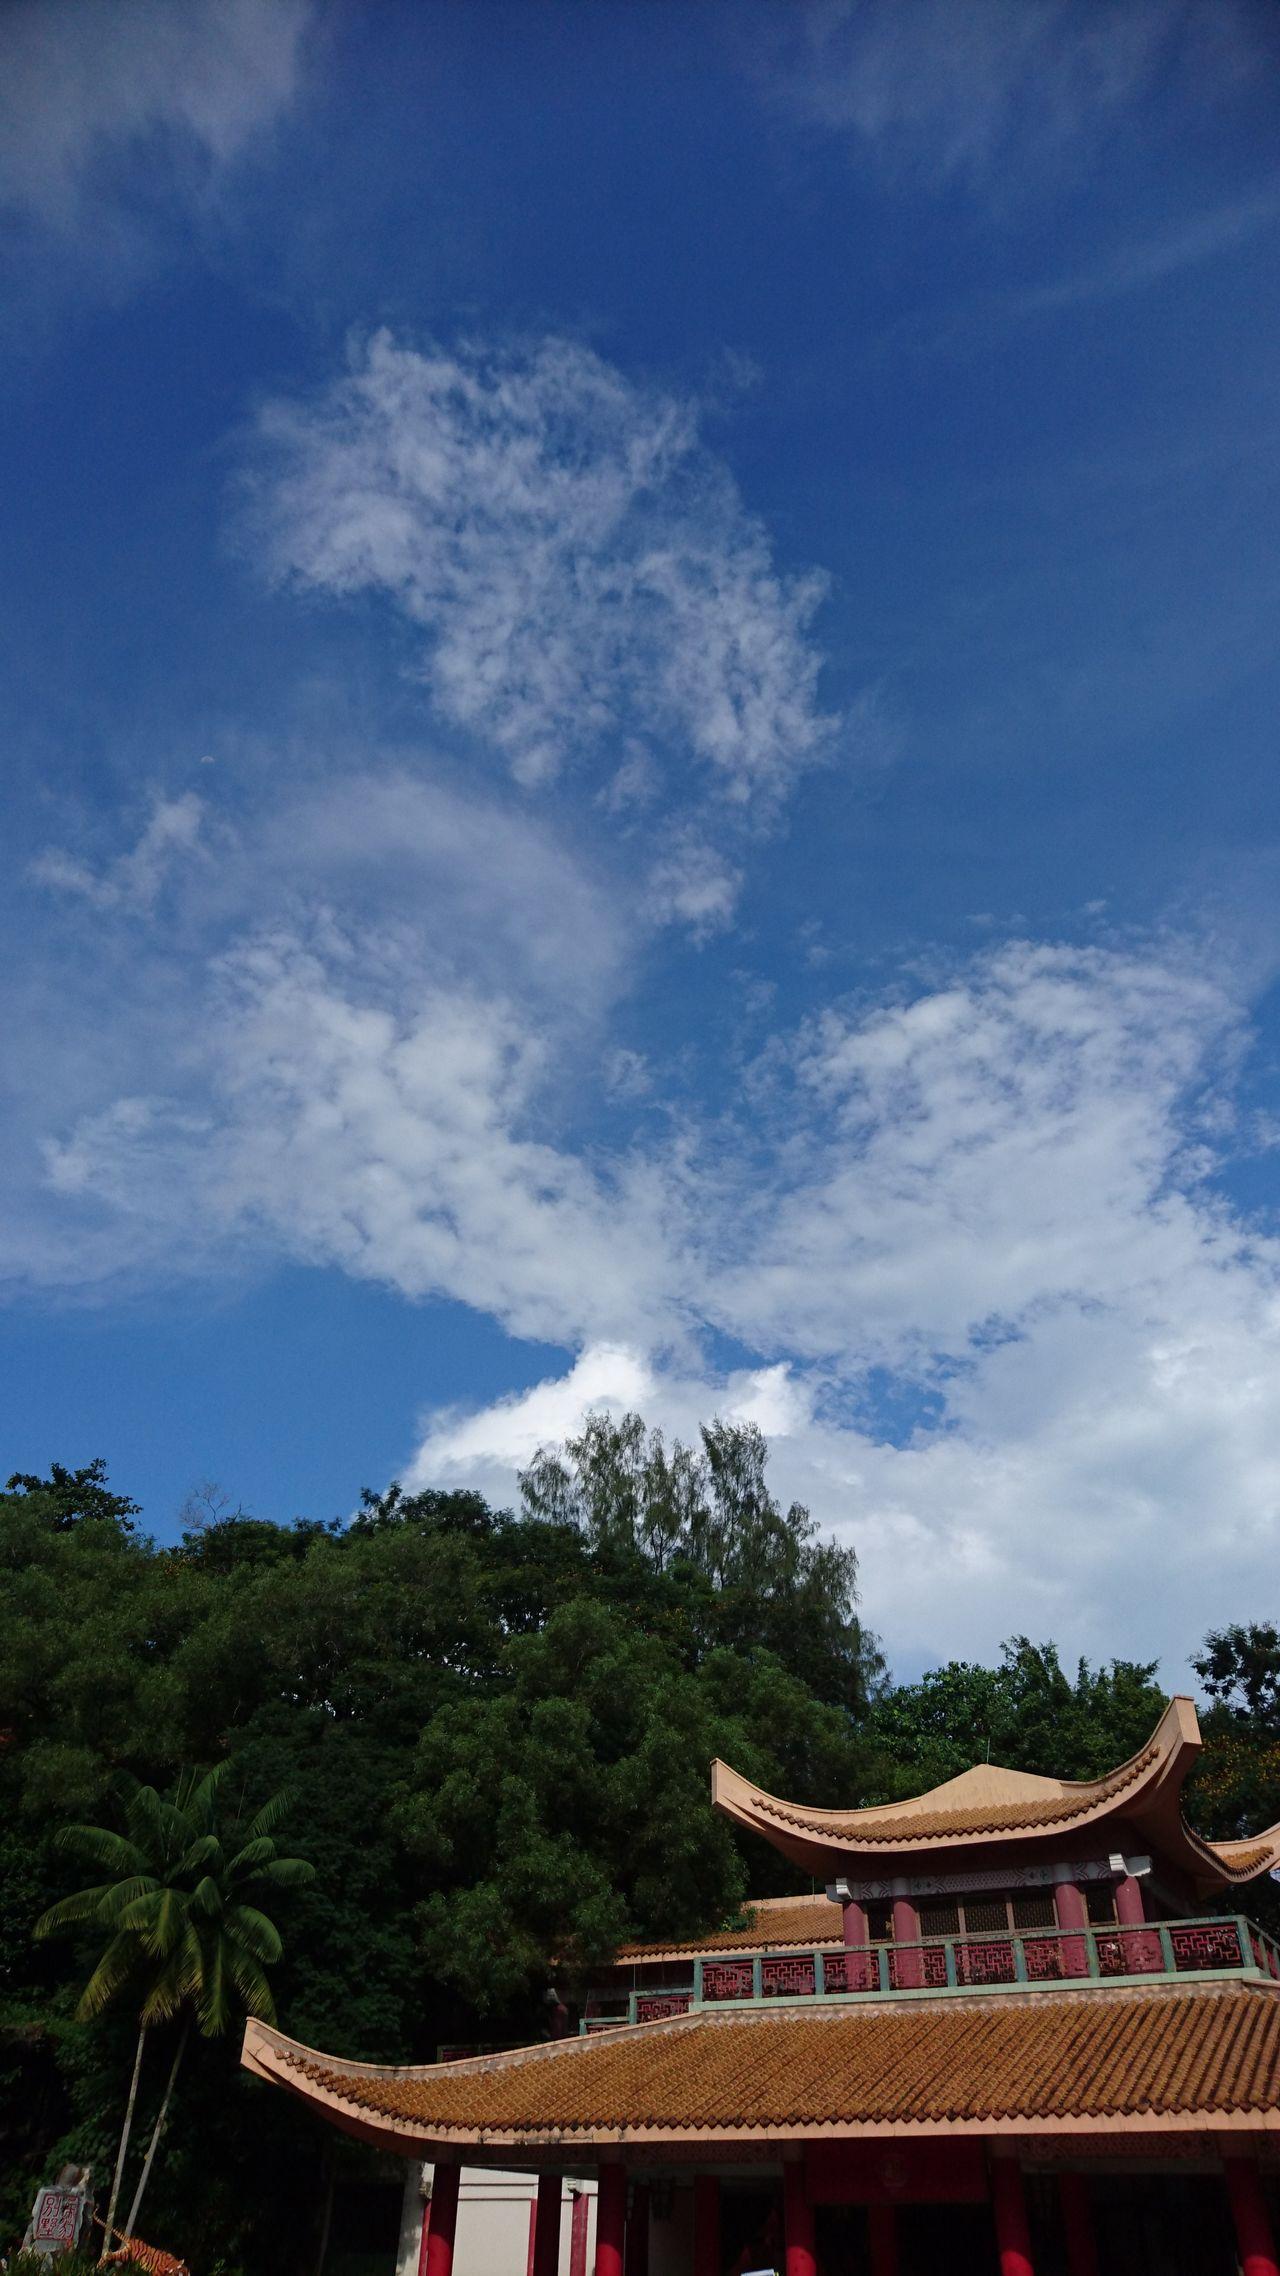 Hawparvilla Singapore Bright Day Cloudy Trees Randomshot